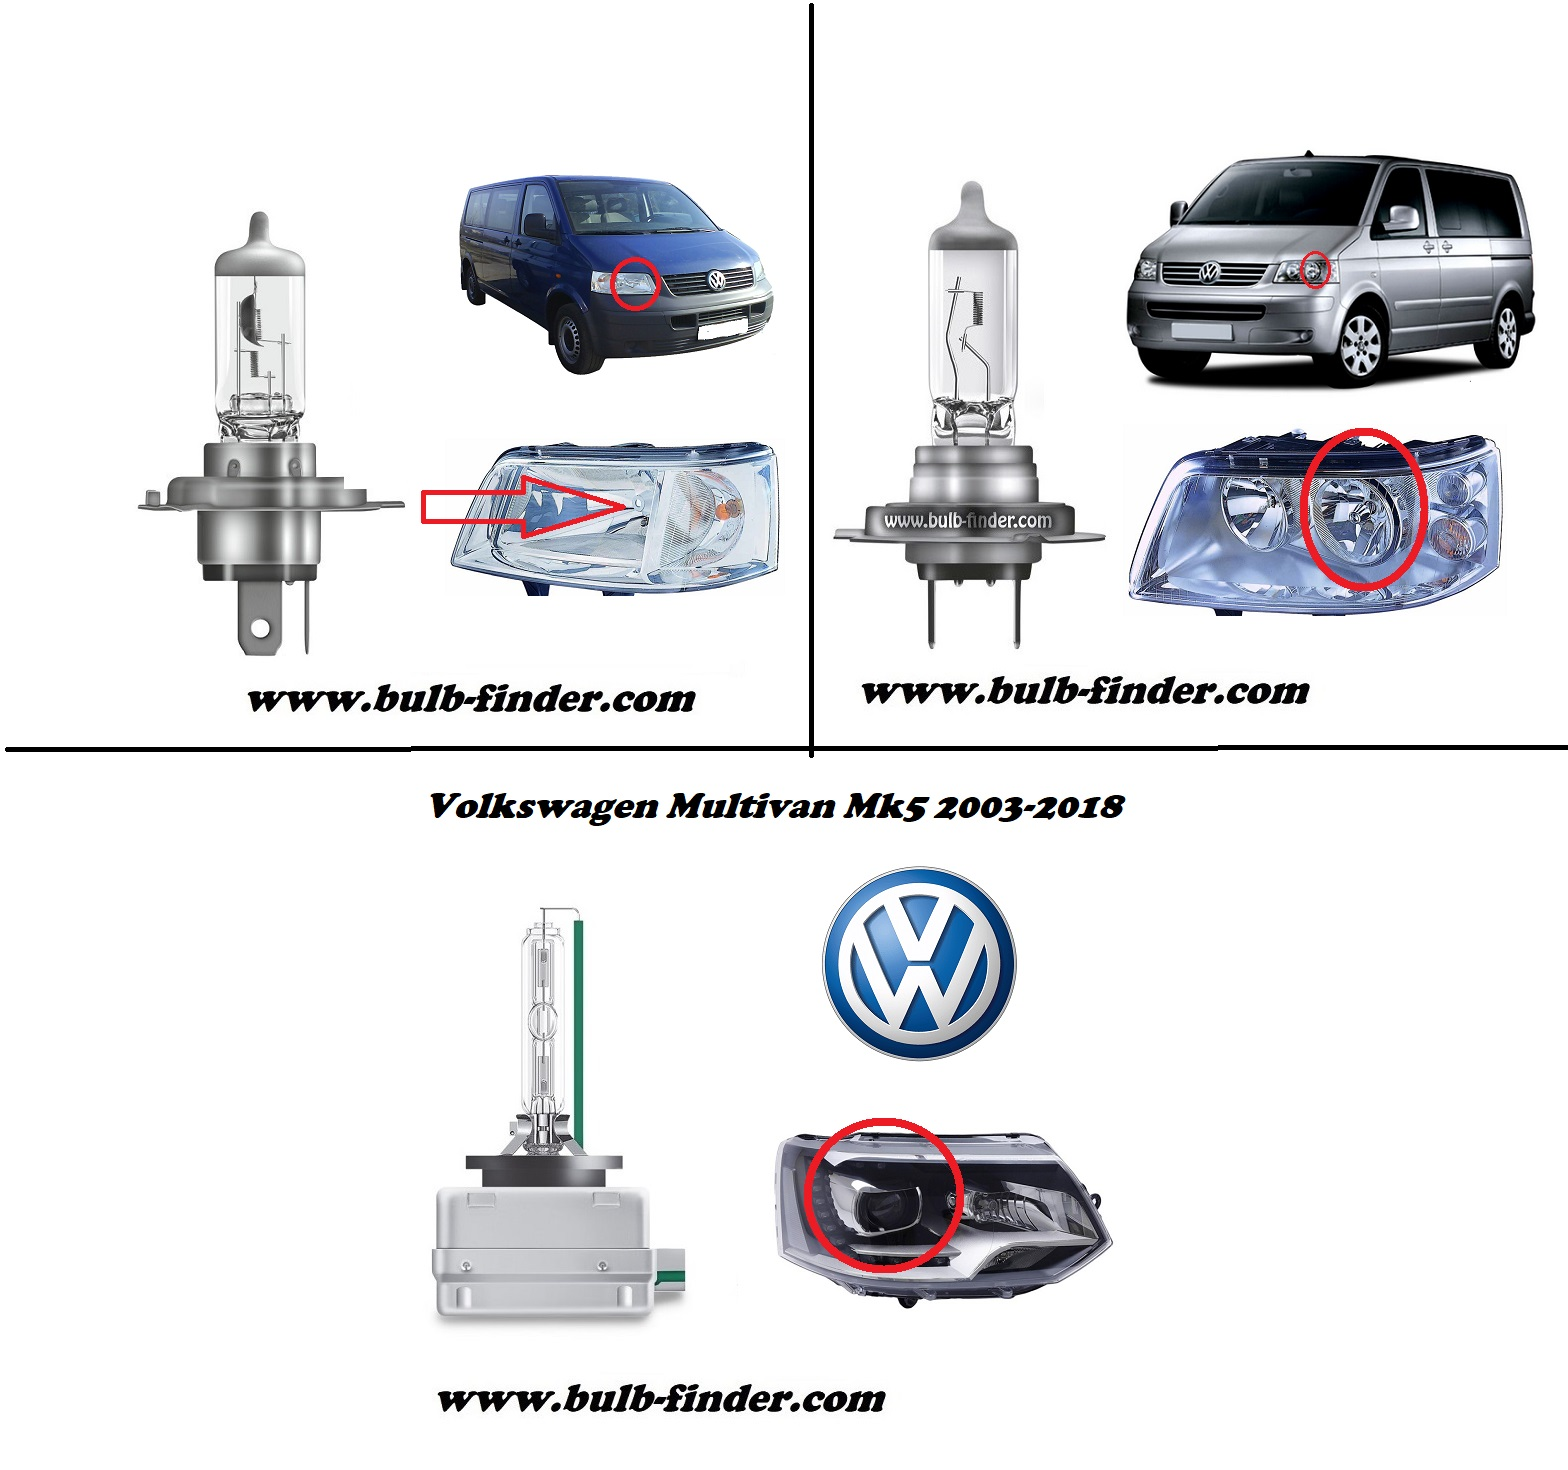 VW Multivan 5 model bulb for LOW BEAM HEADLIGHT specification